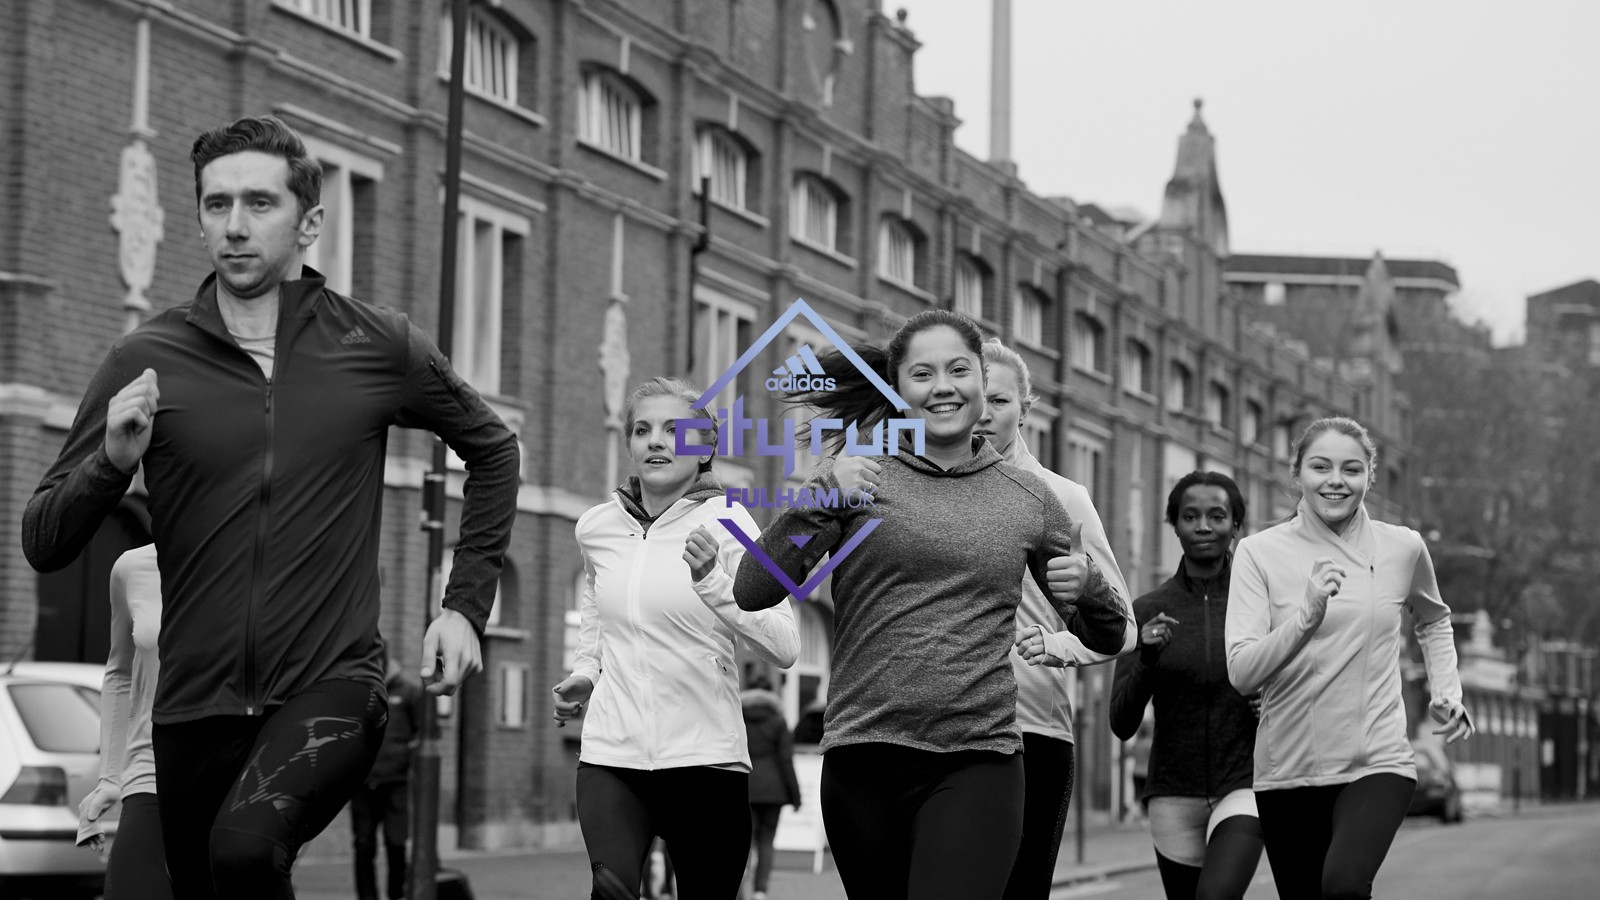 Adidas City Runs \u002D Fulham 10k - cover image